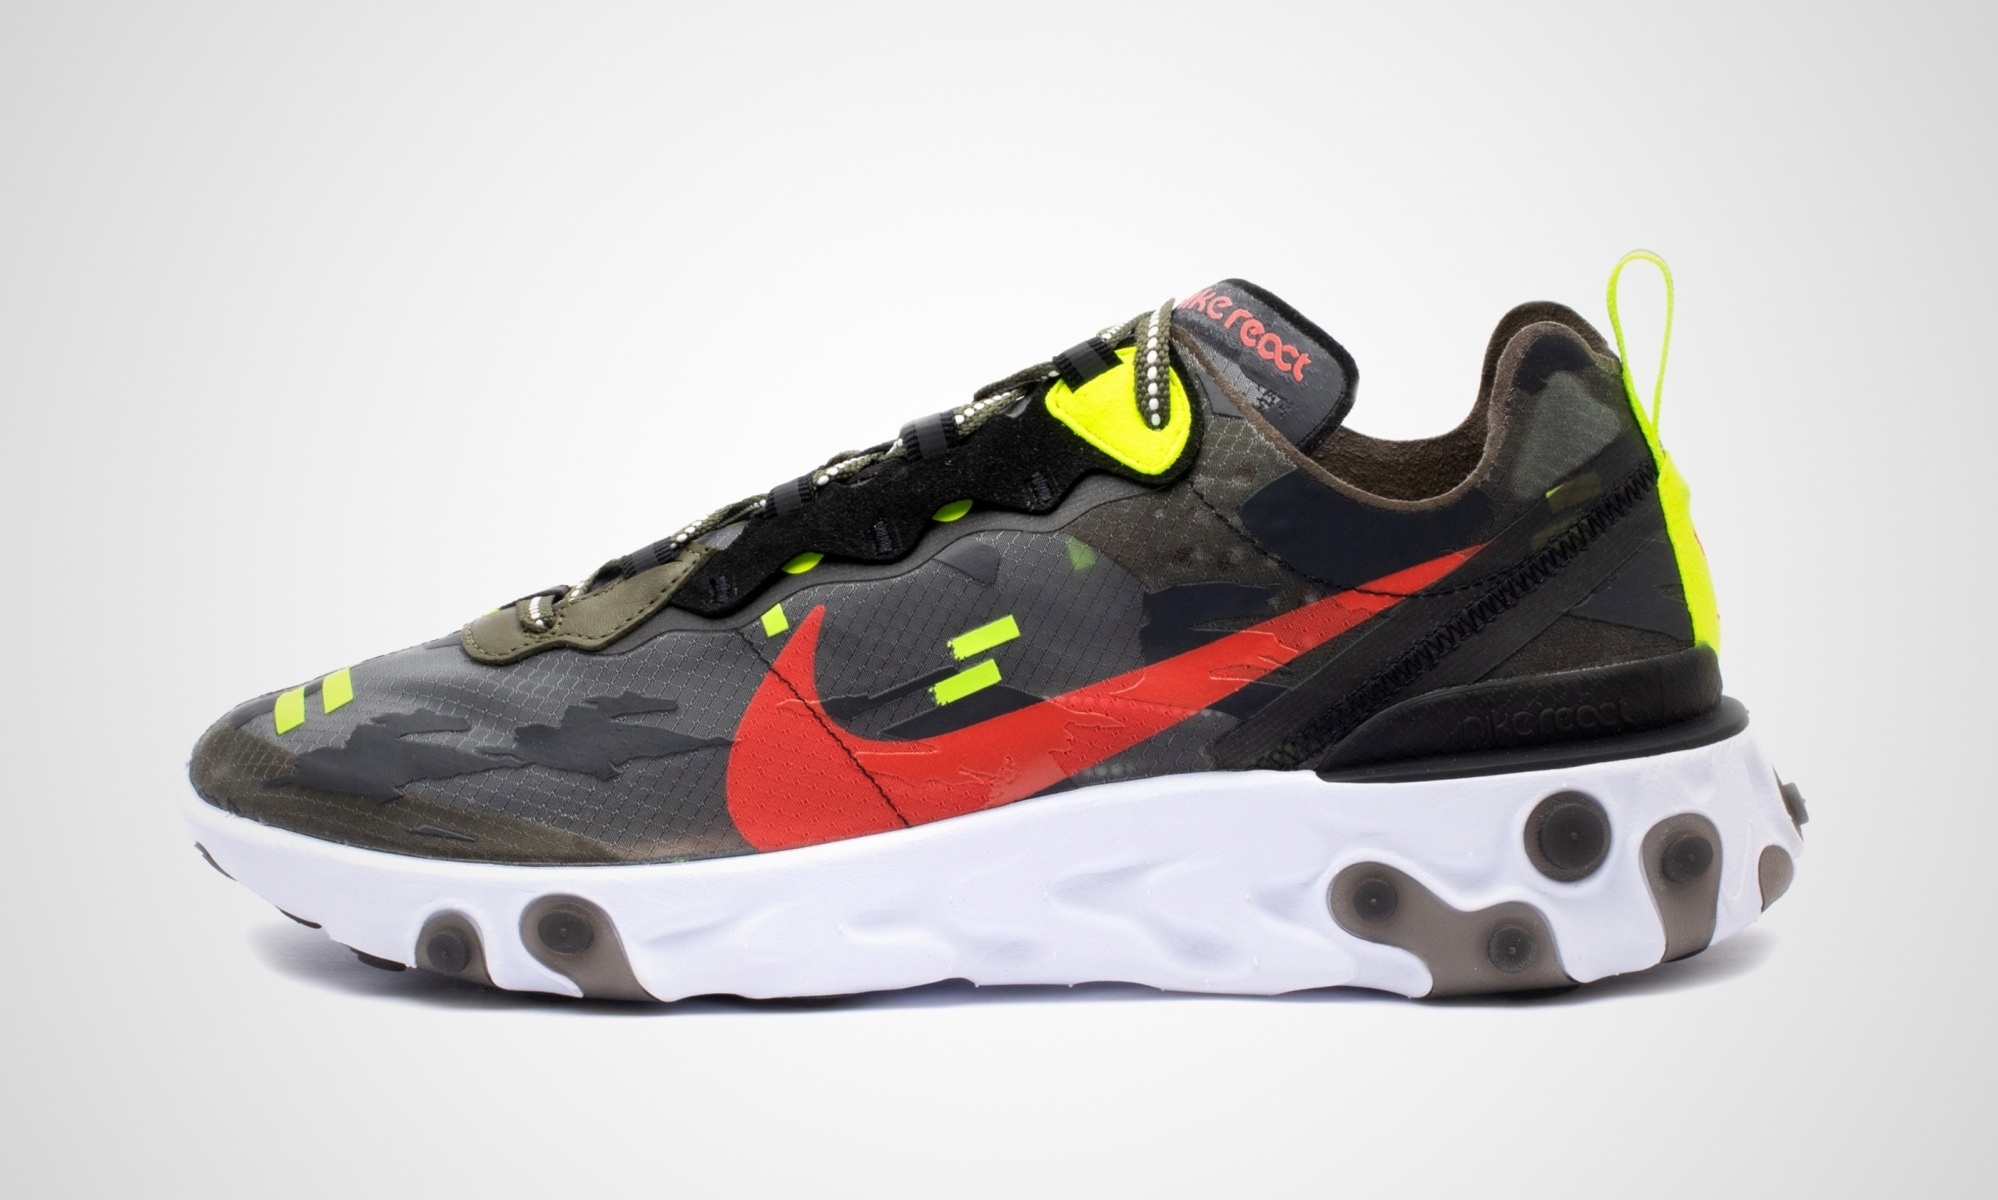 Nike Air Presto Digi Camo   Dead Stock Sneakerblog